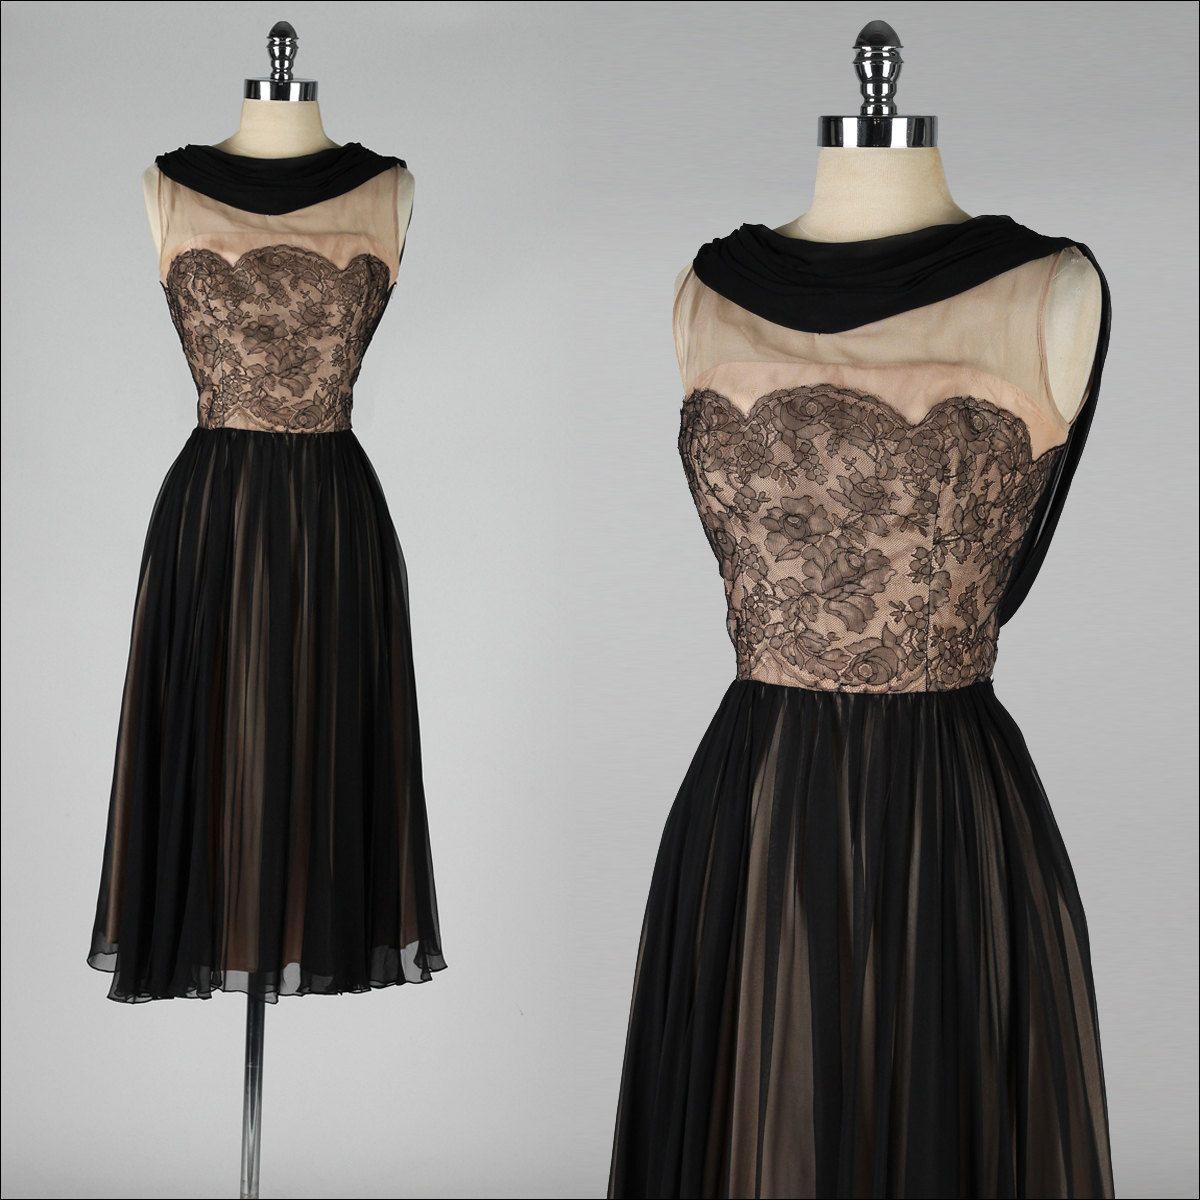 Vintage s dress black lace illusion by millstreetvintage